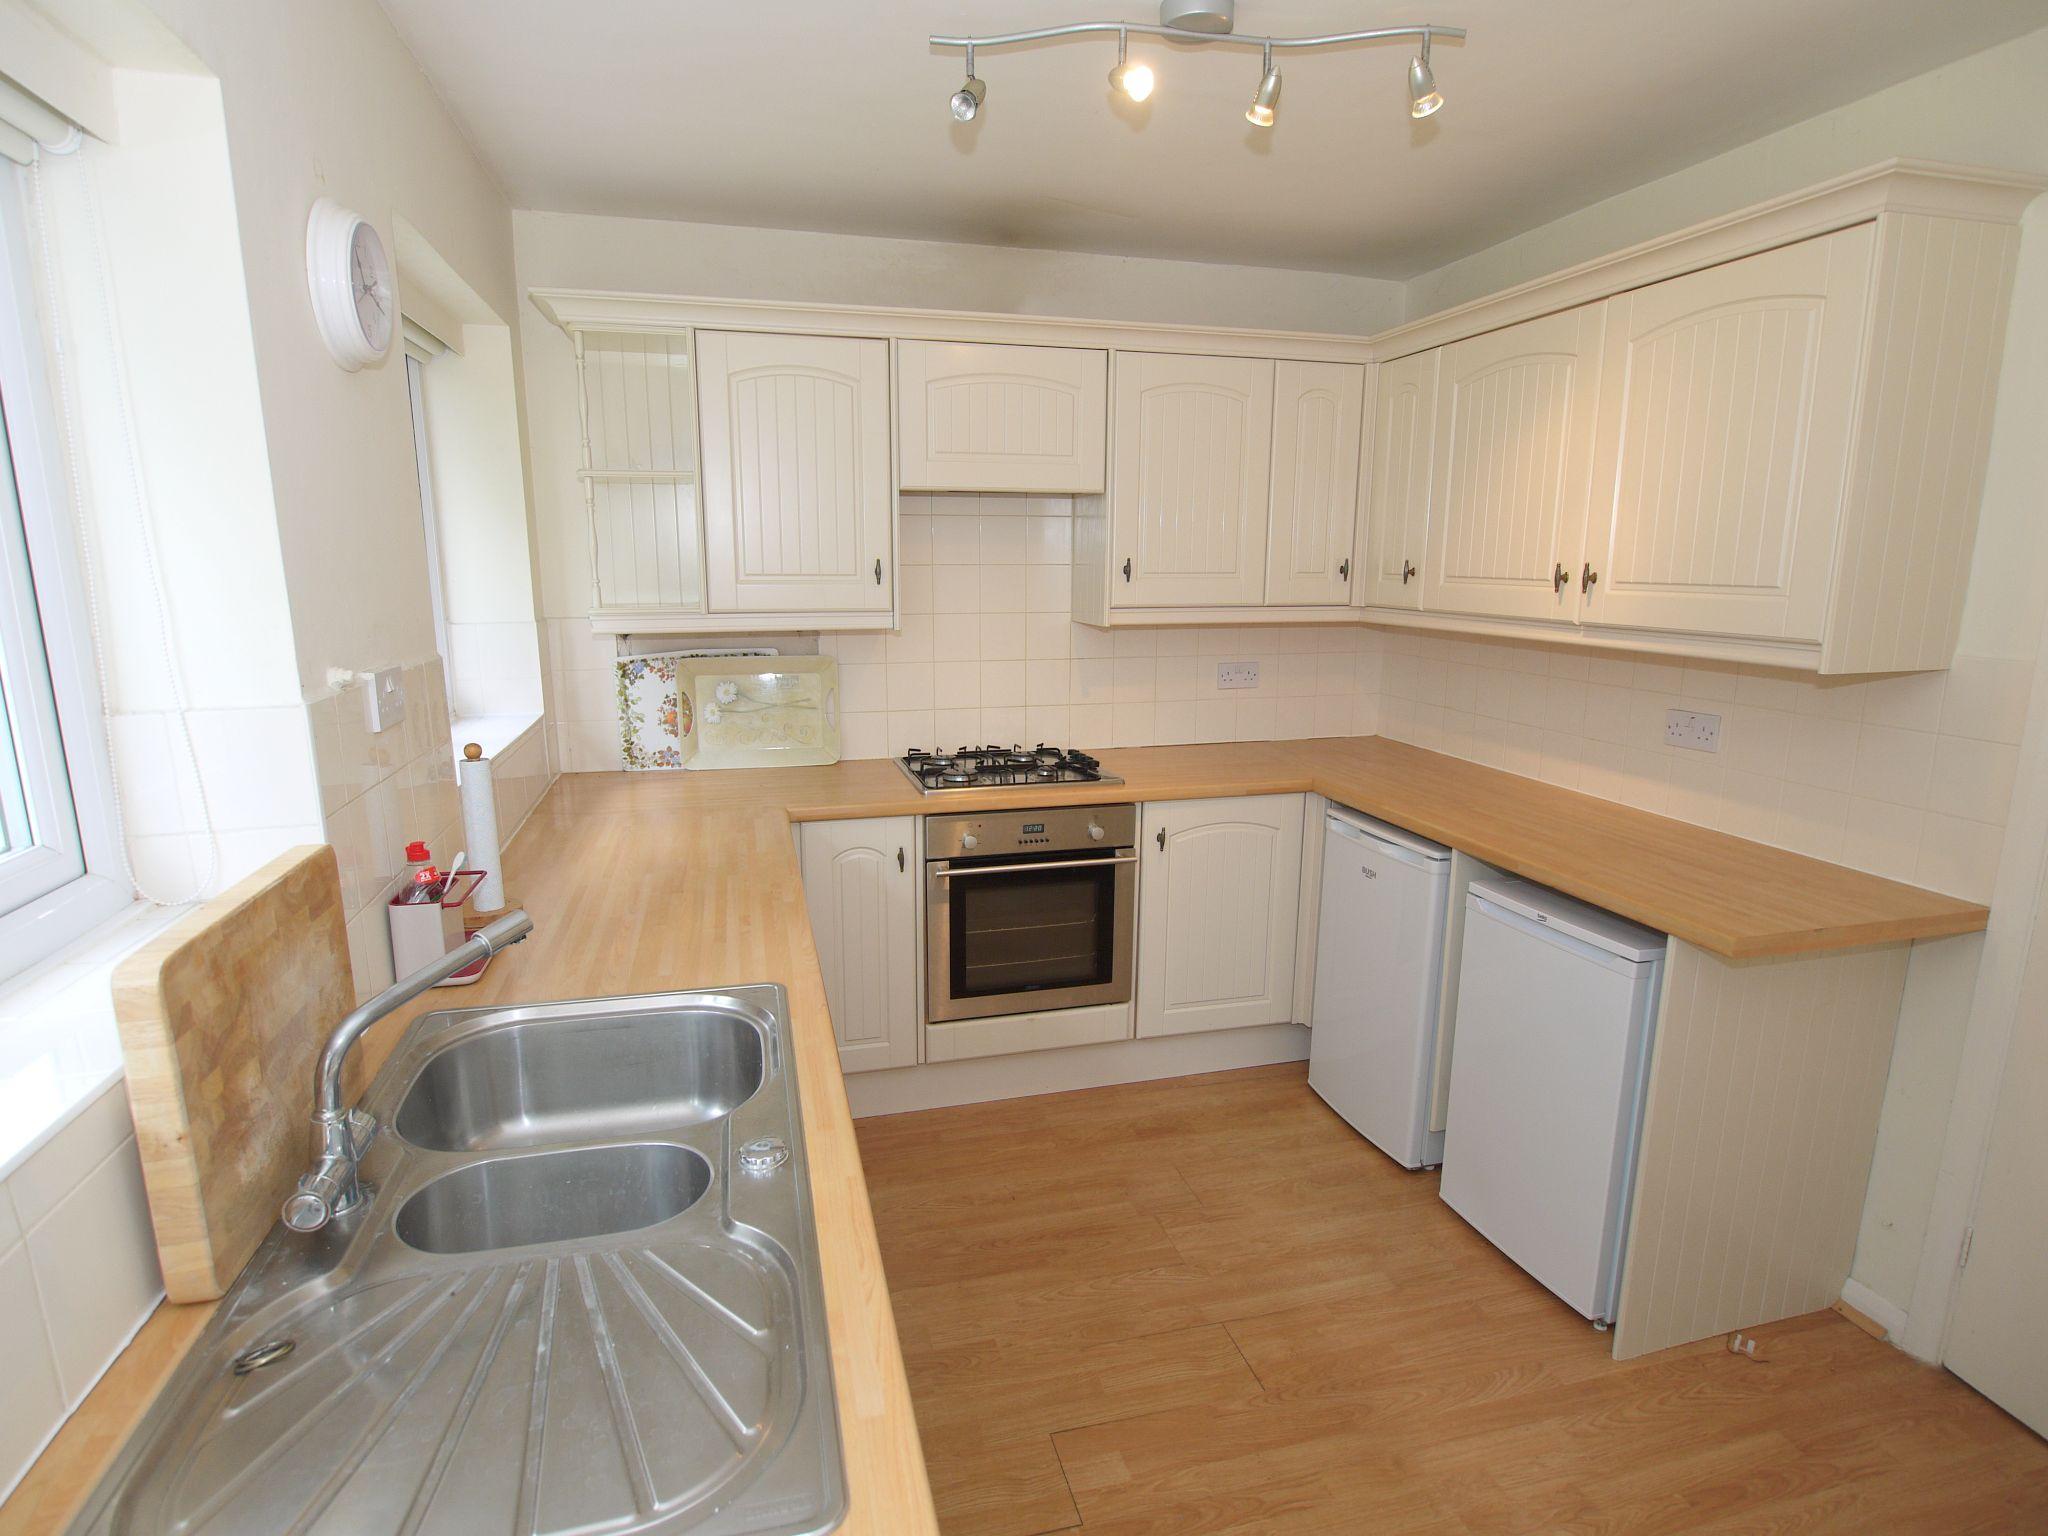 2 bedroom detached bungalow Sold in Sevenoaks - Photograph 3